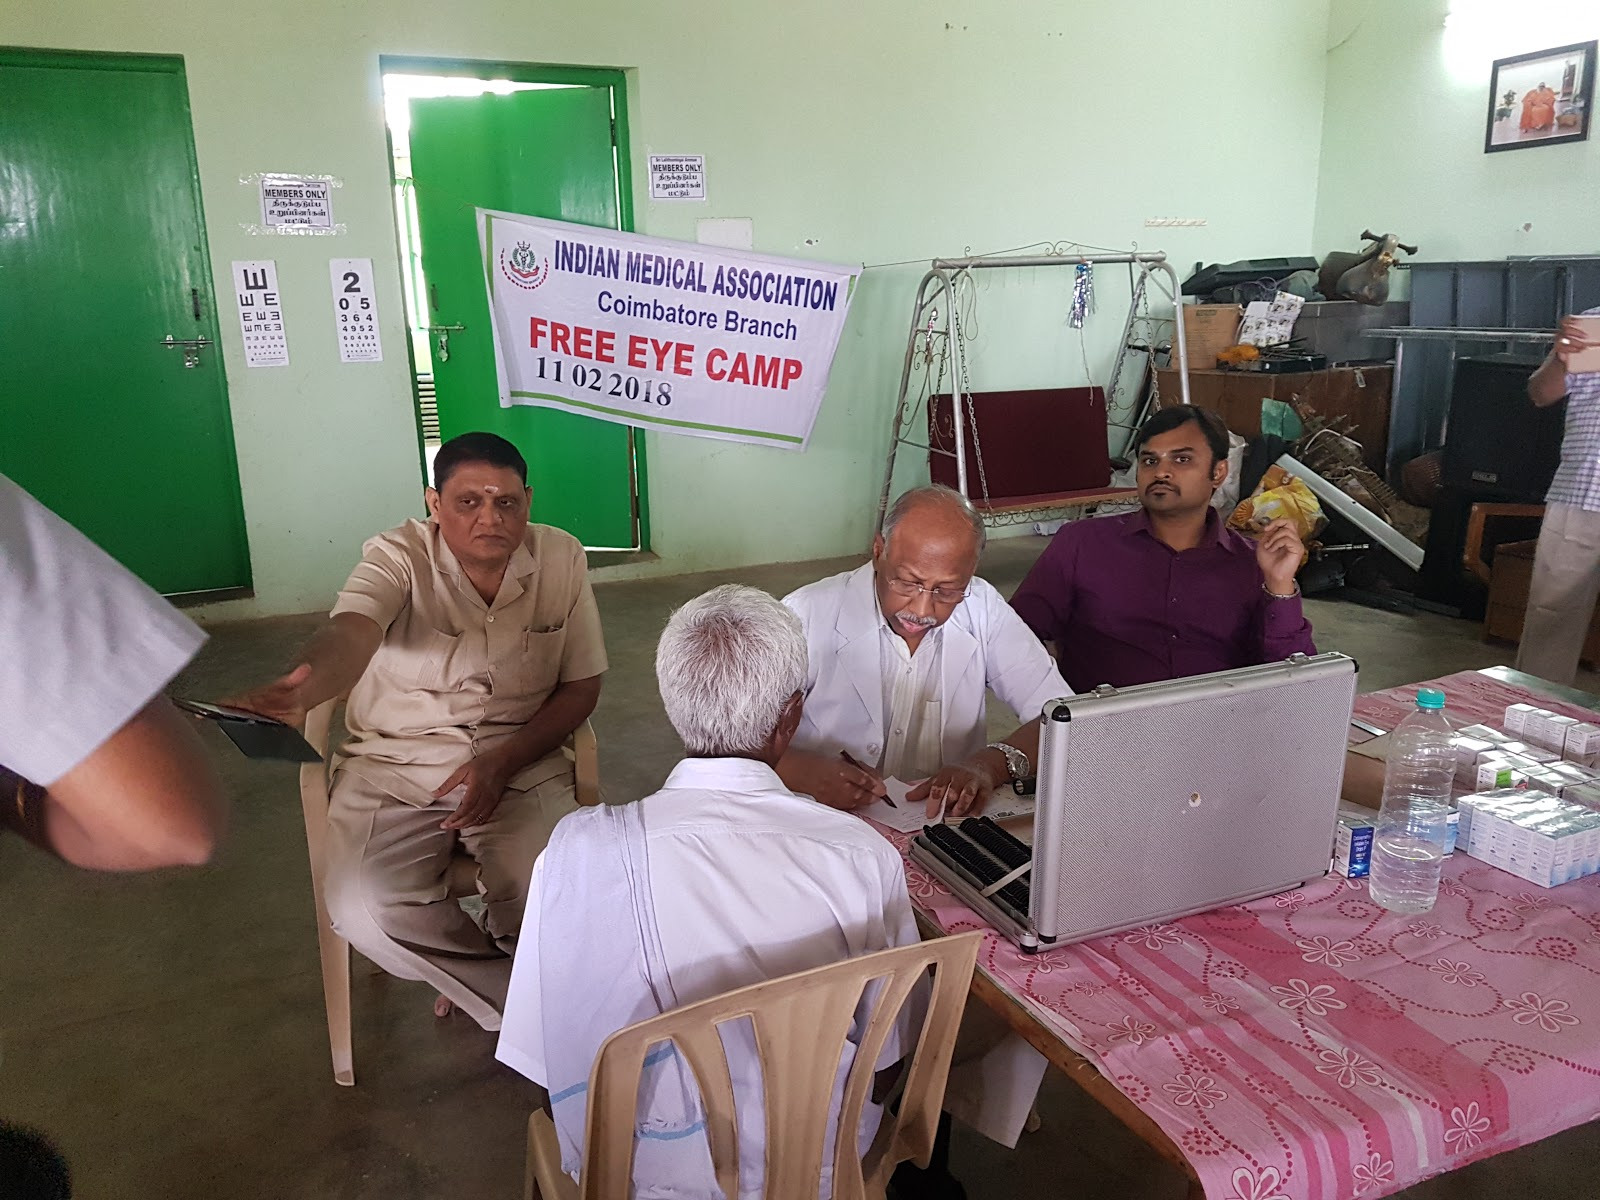 blood bank The Indian Medical Association-Coimbatore Branch near Coimbatore Tamil Nadu